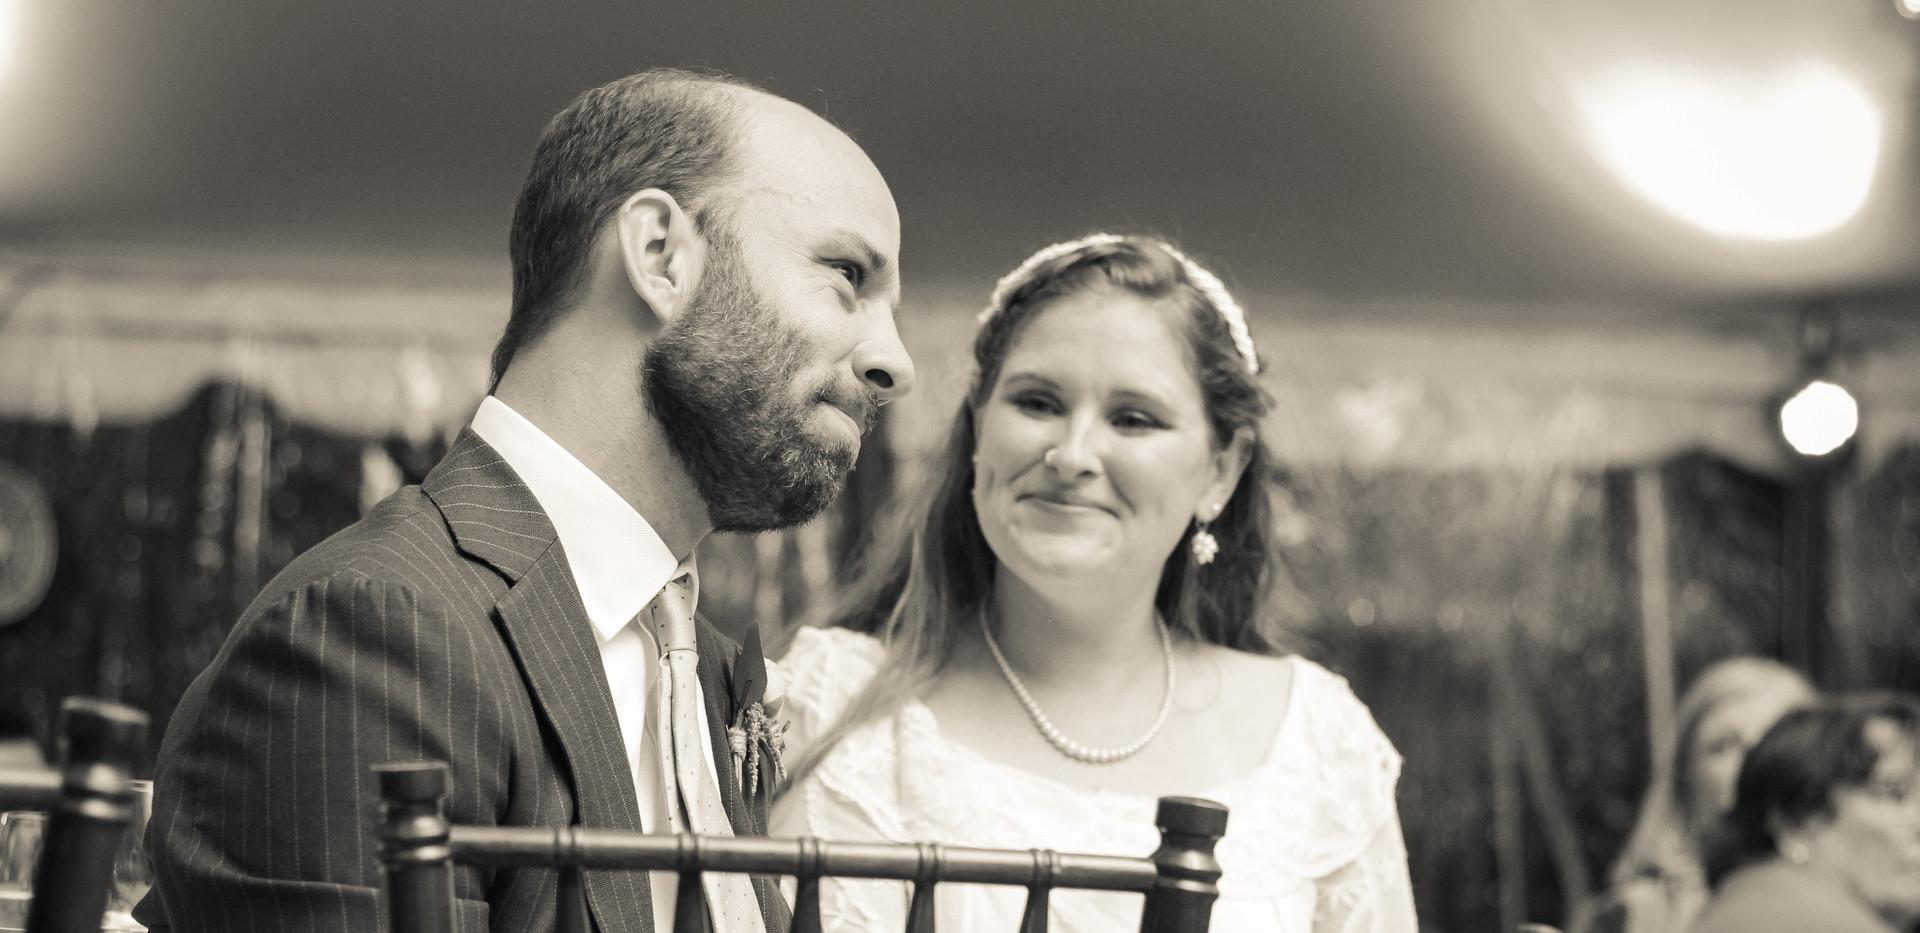 Sarah&Dylan-889.jpg